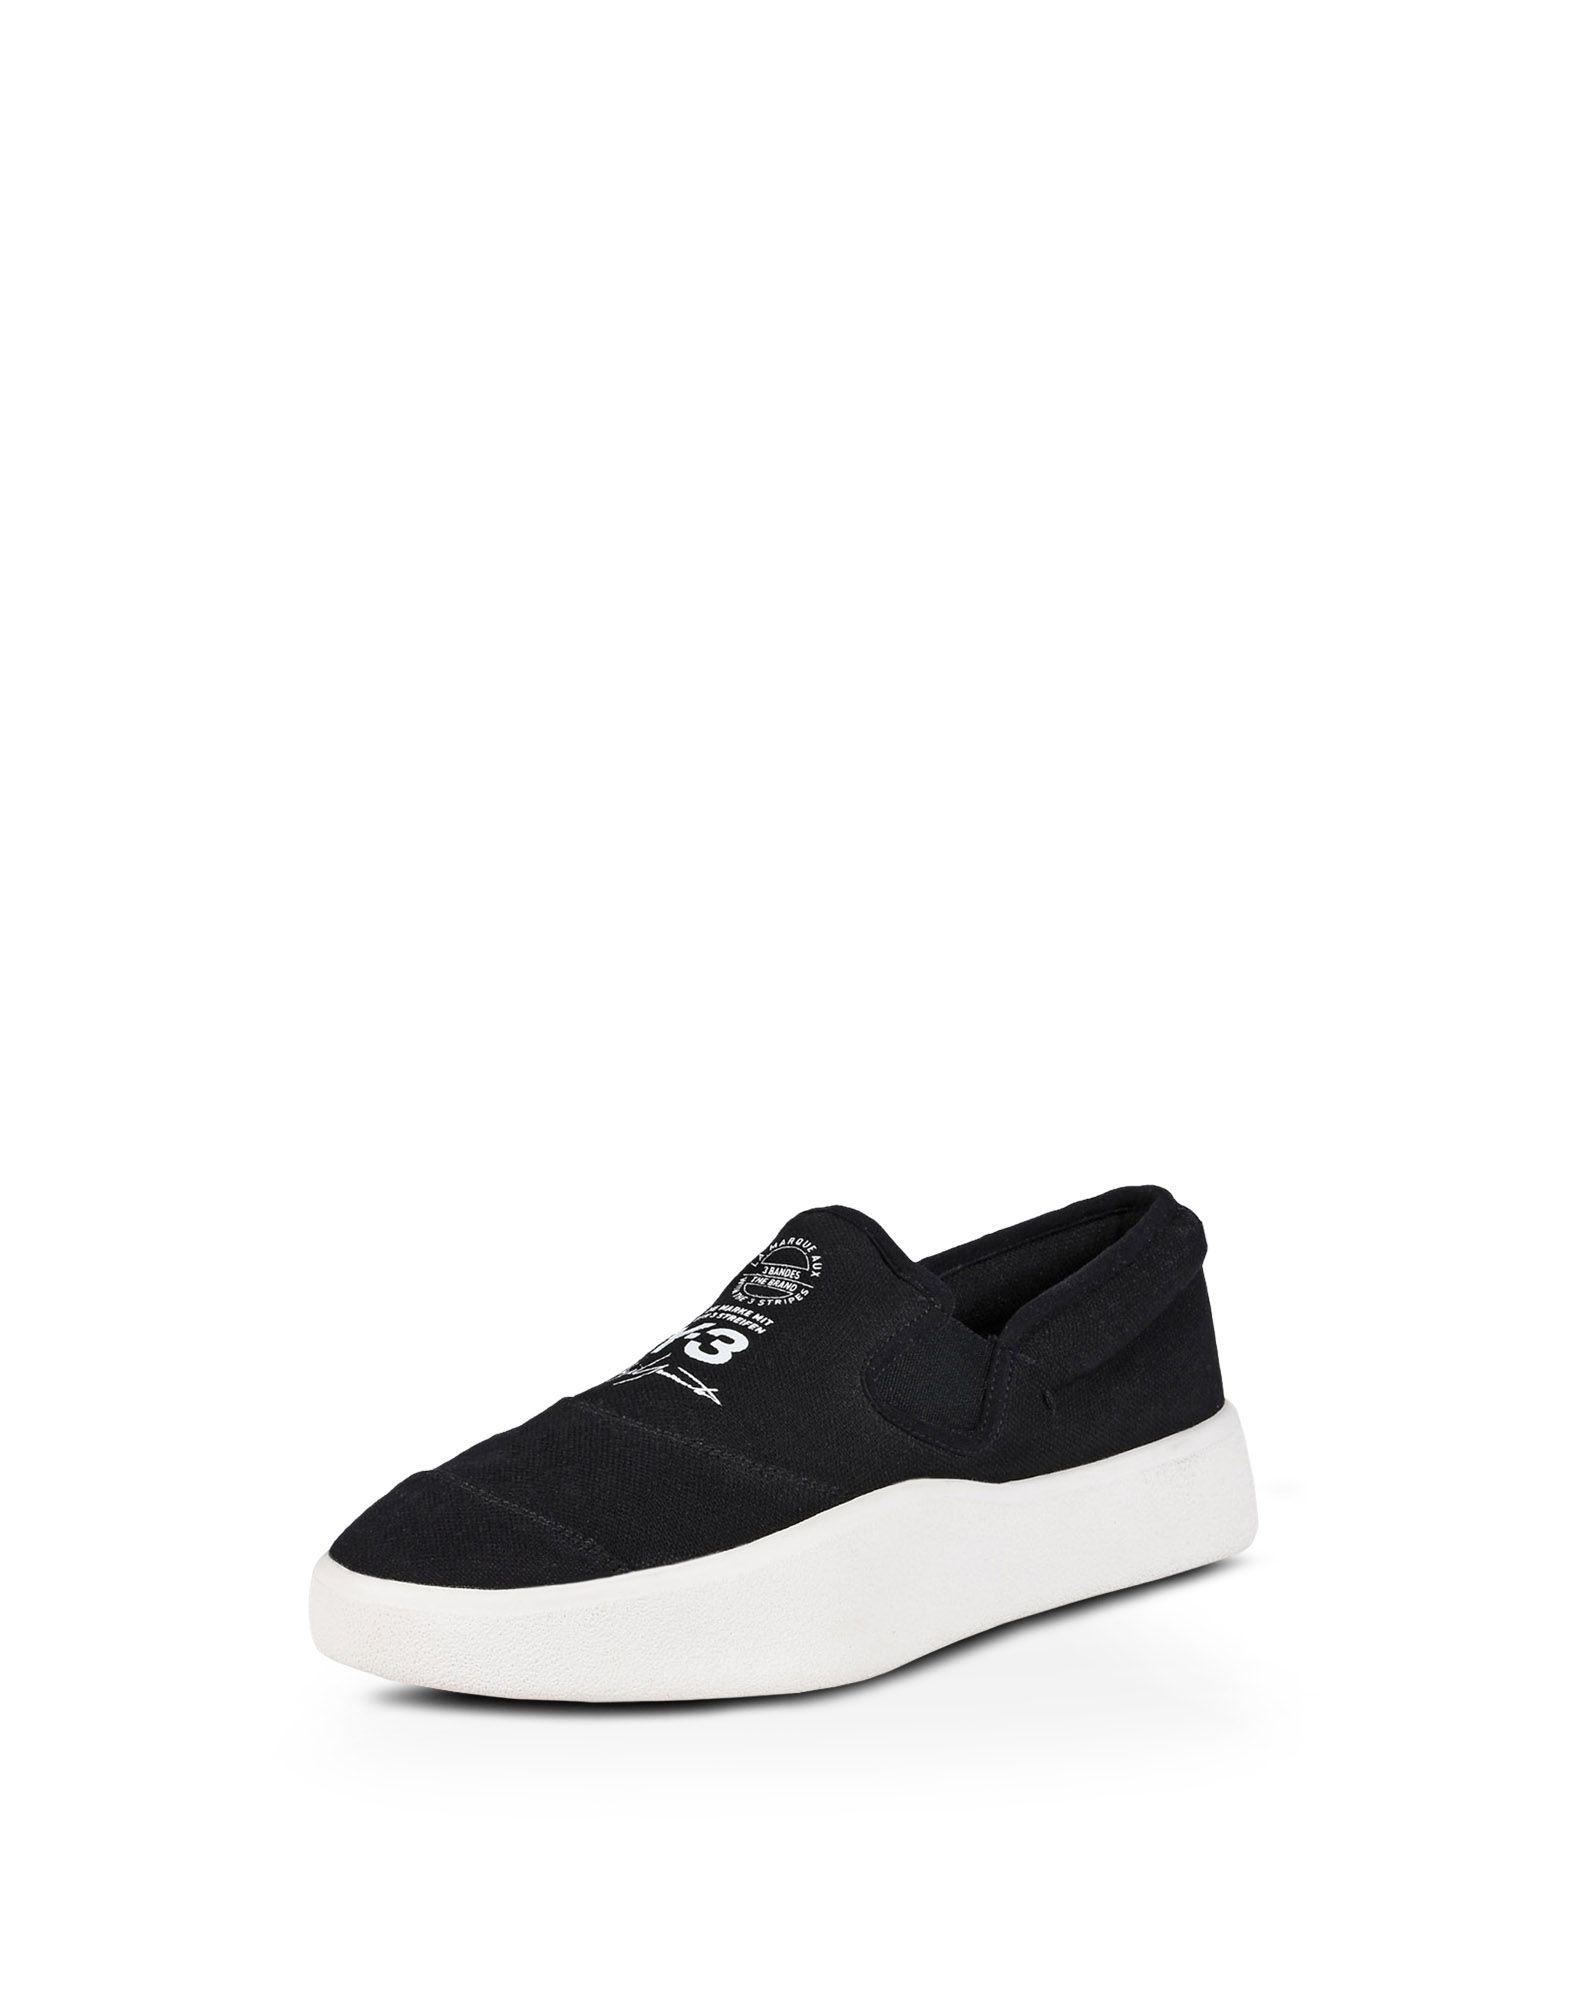 White and Black Y-3 Tangutsu Slip-On Sneakers Yohji Yamamoto 2FRwjm8